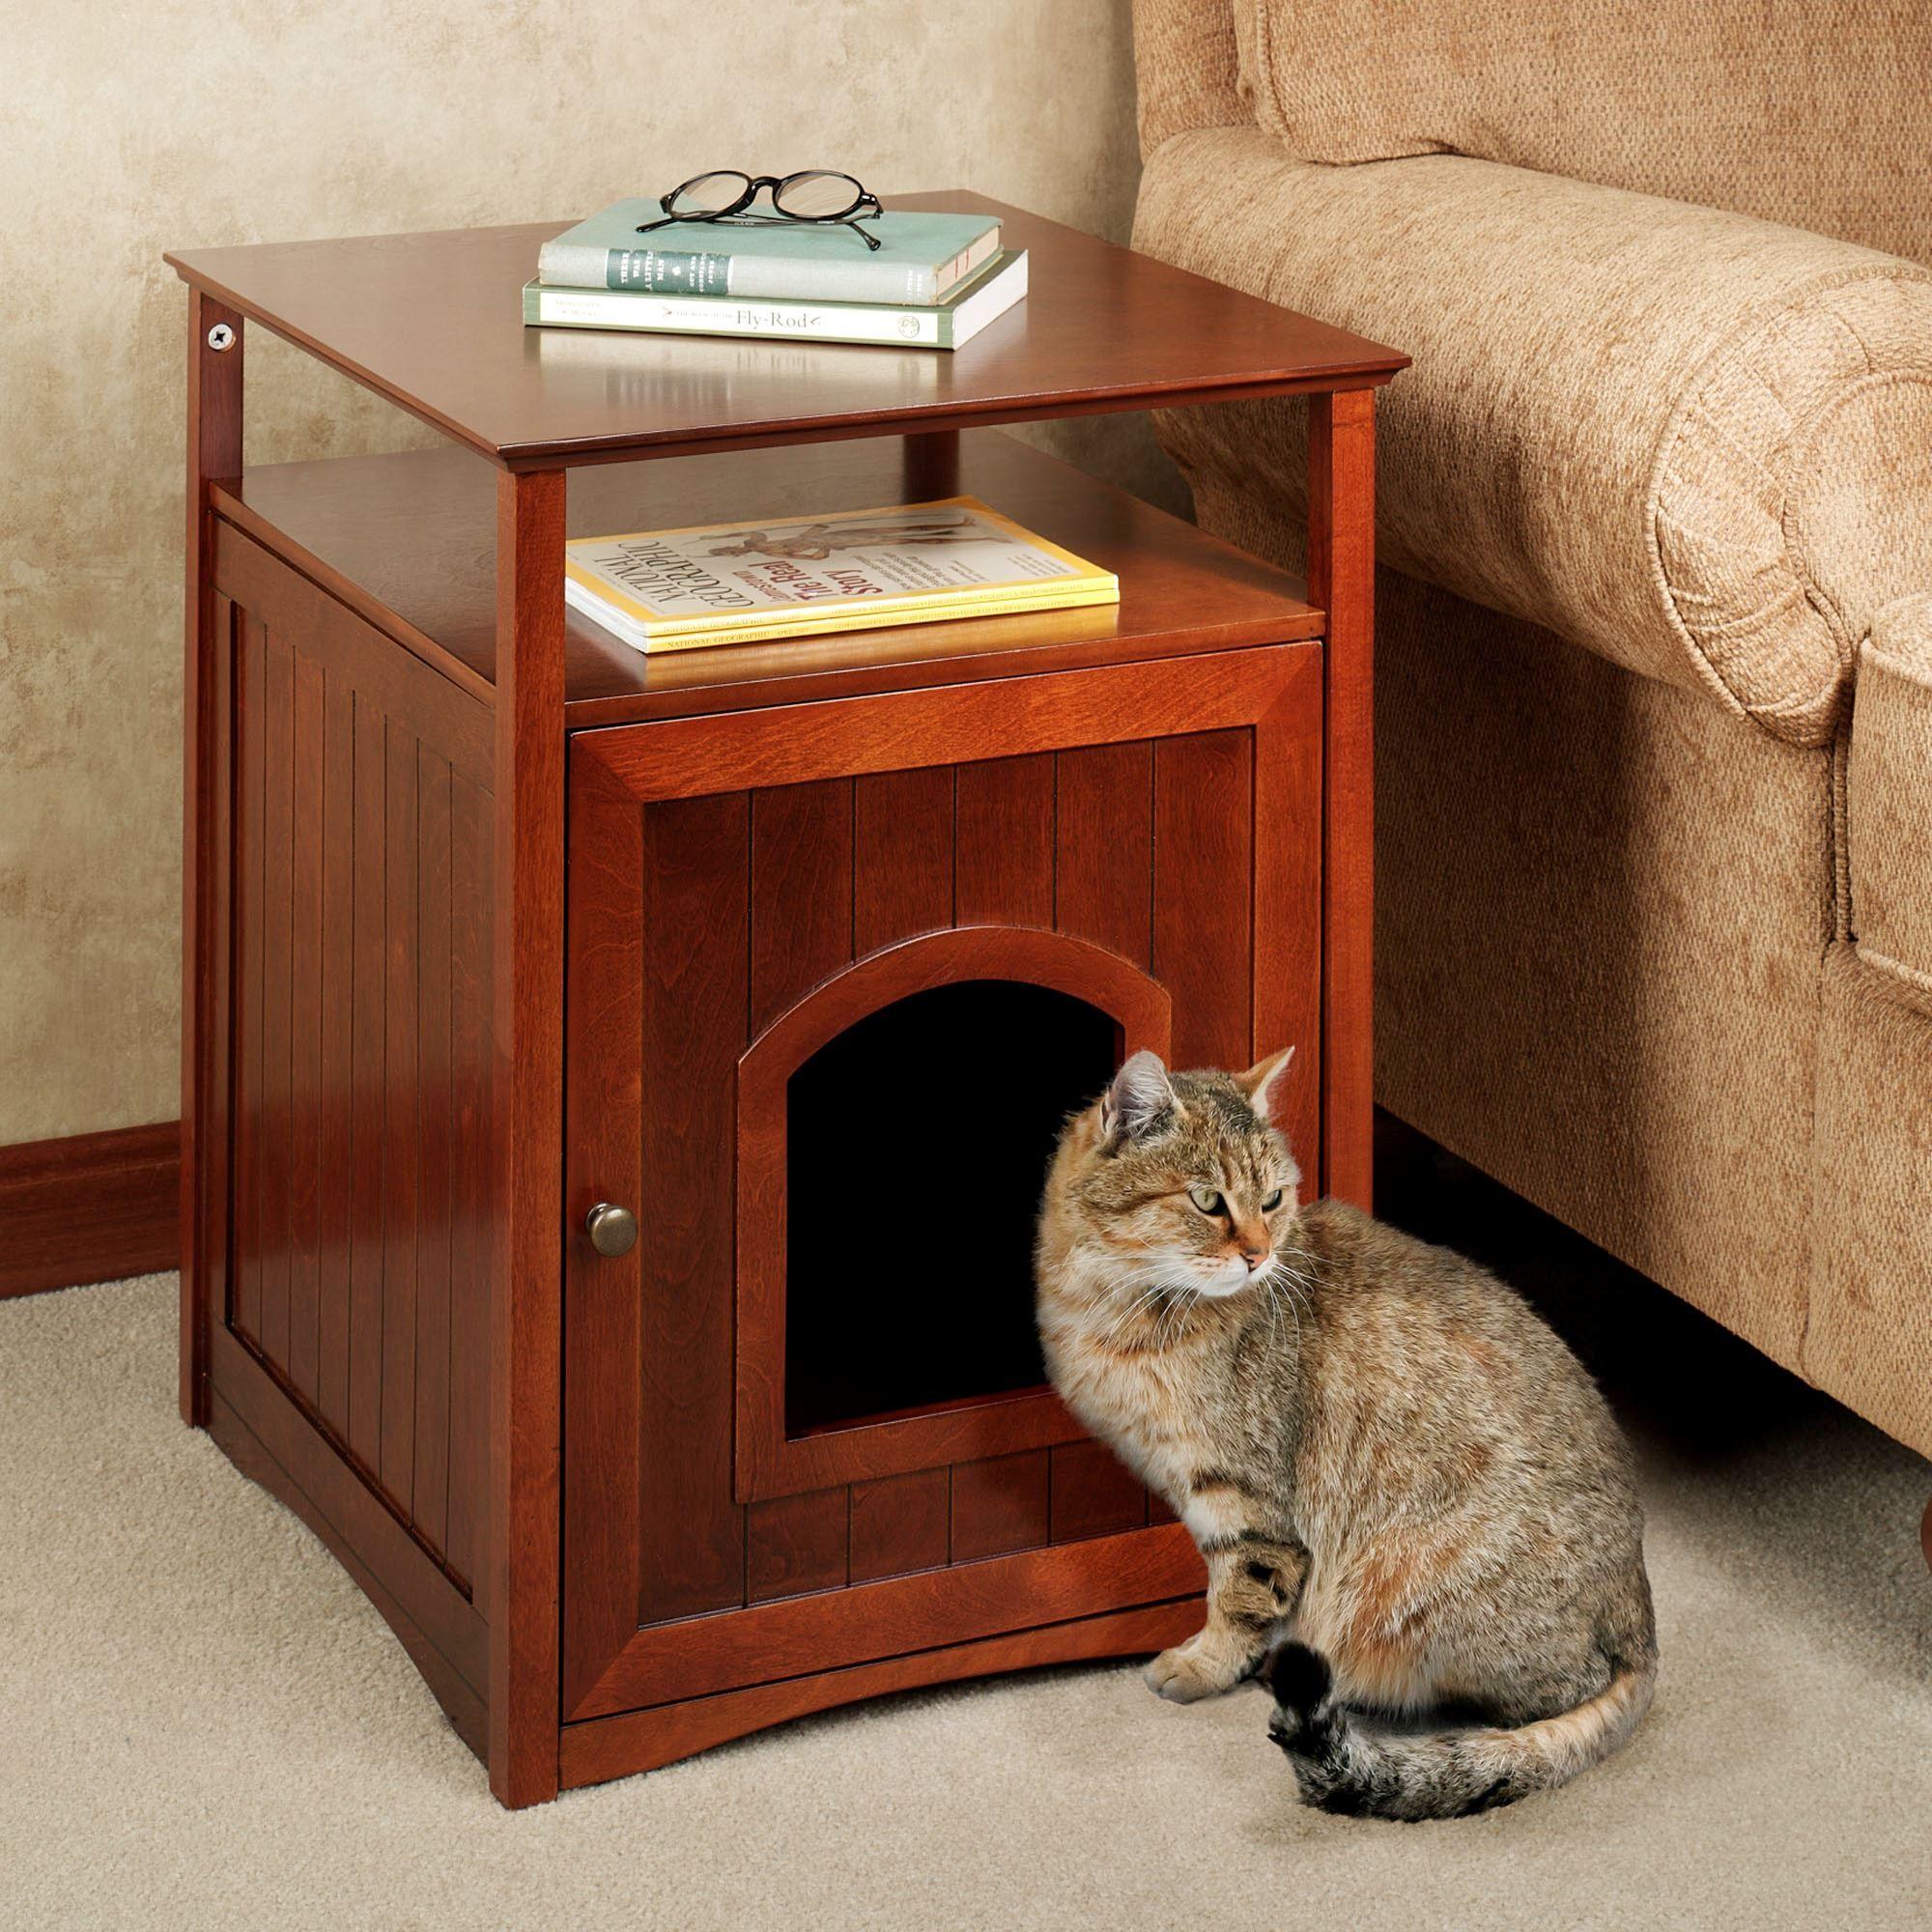 end greenspan wayfair storage with three pdx posts reviews table furniture